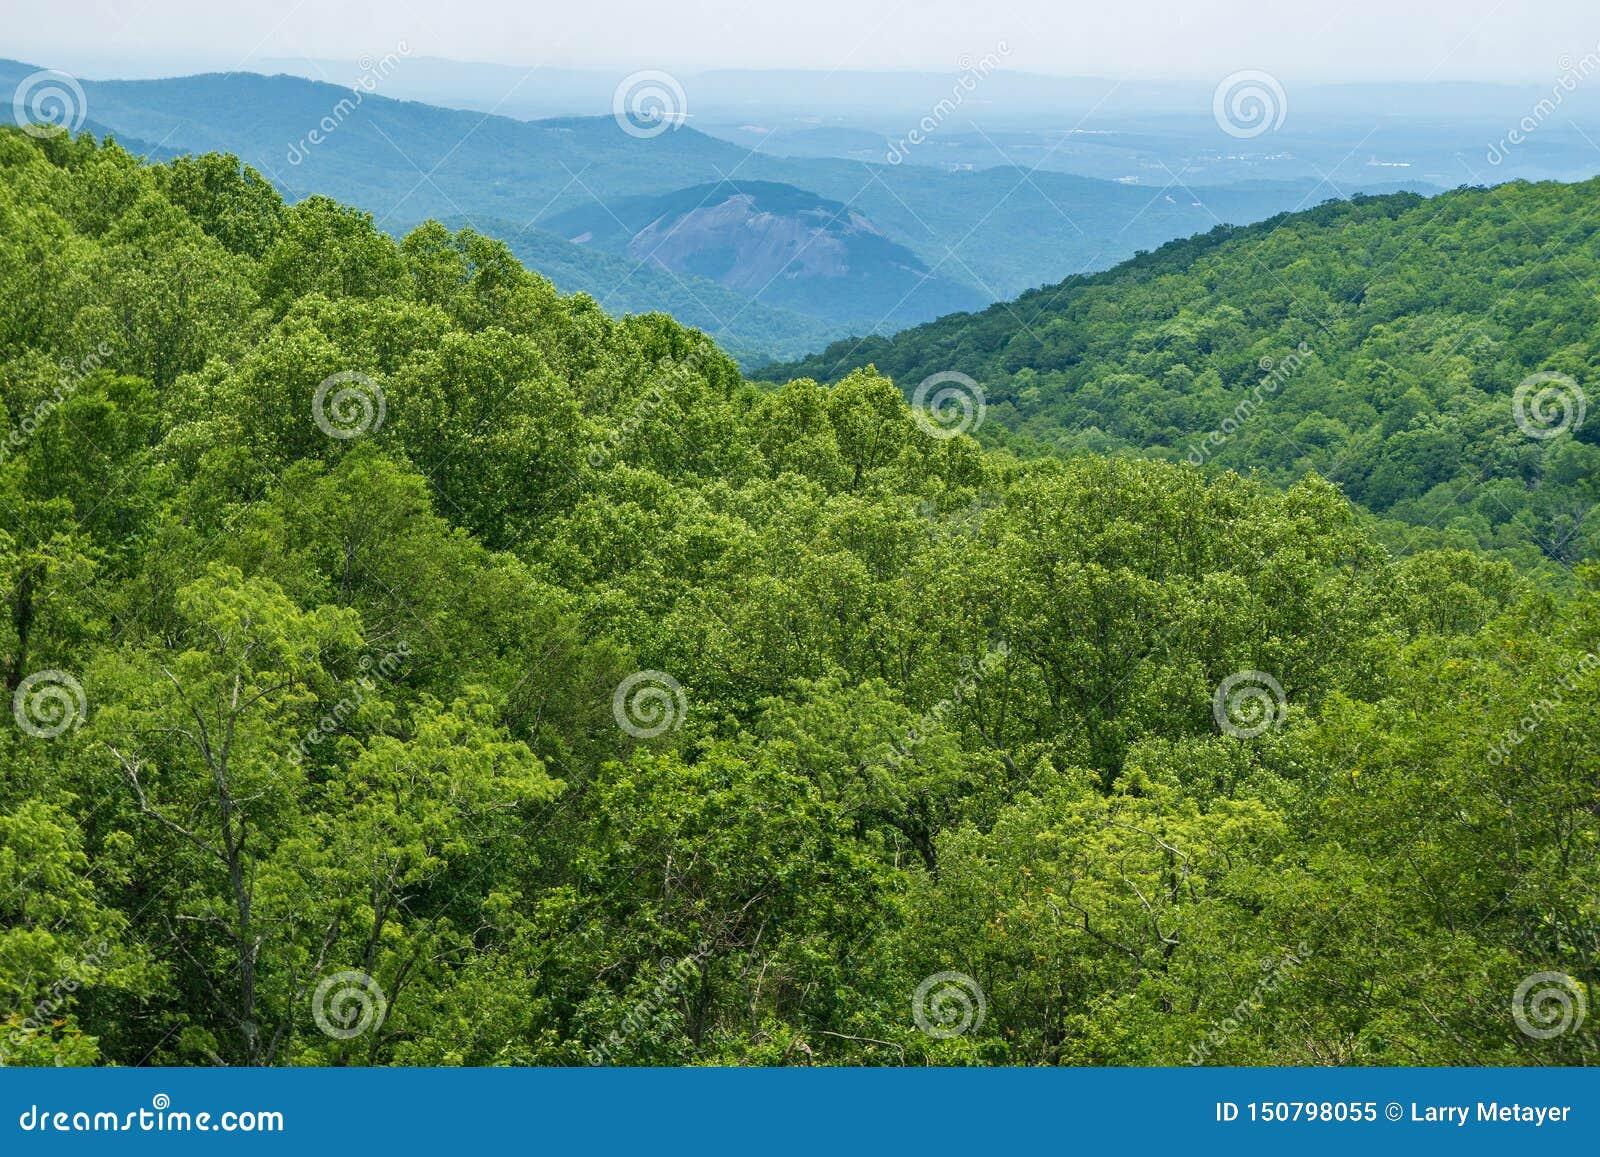 Blue Ridge Mountain In North Carolina Usa Stock Image